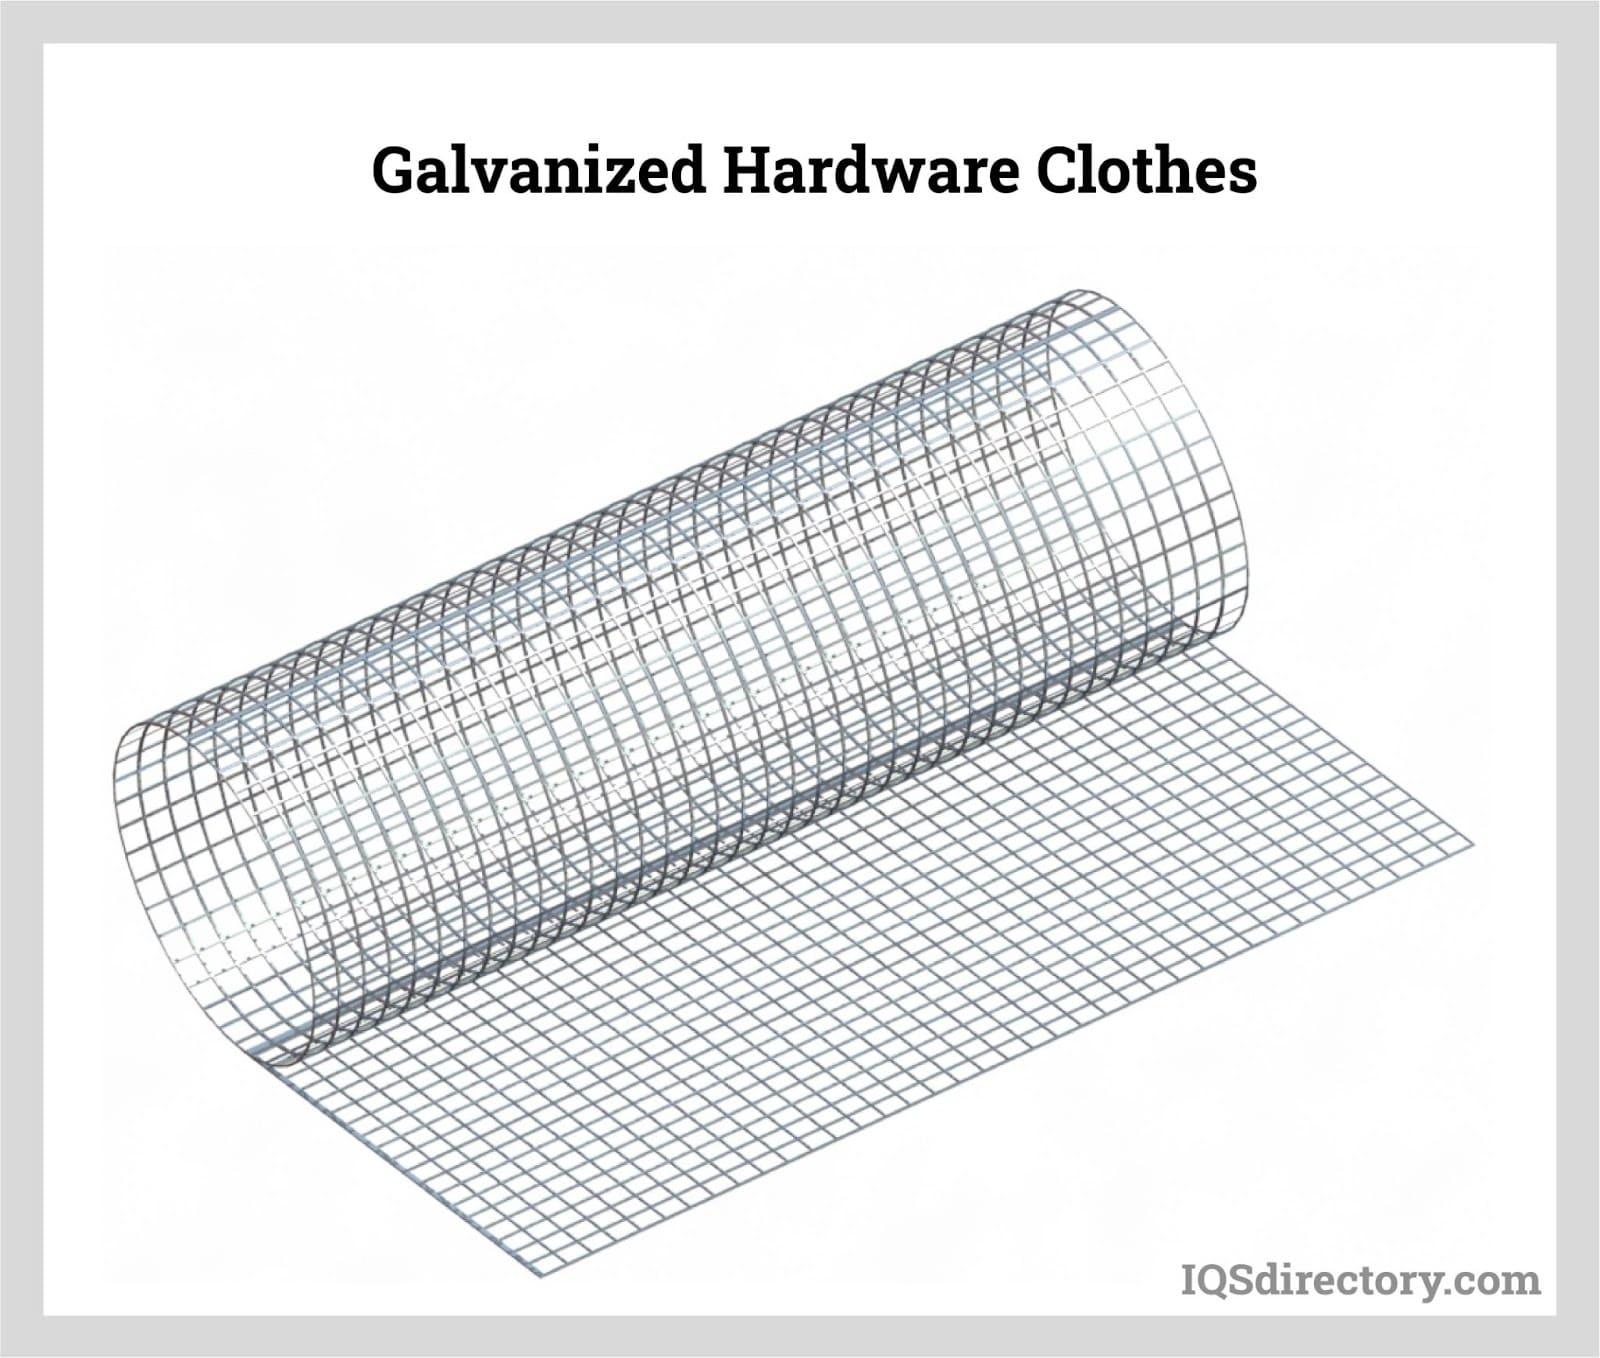 Galvanized Hardware Clothes